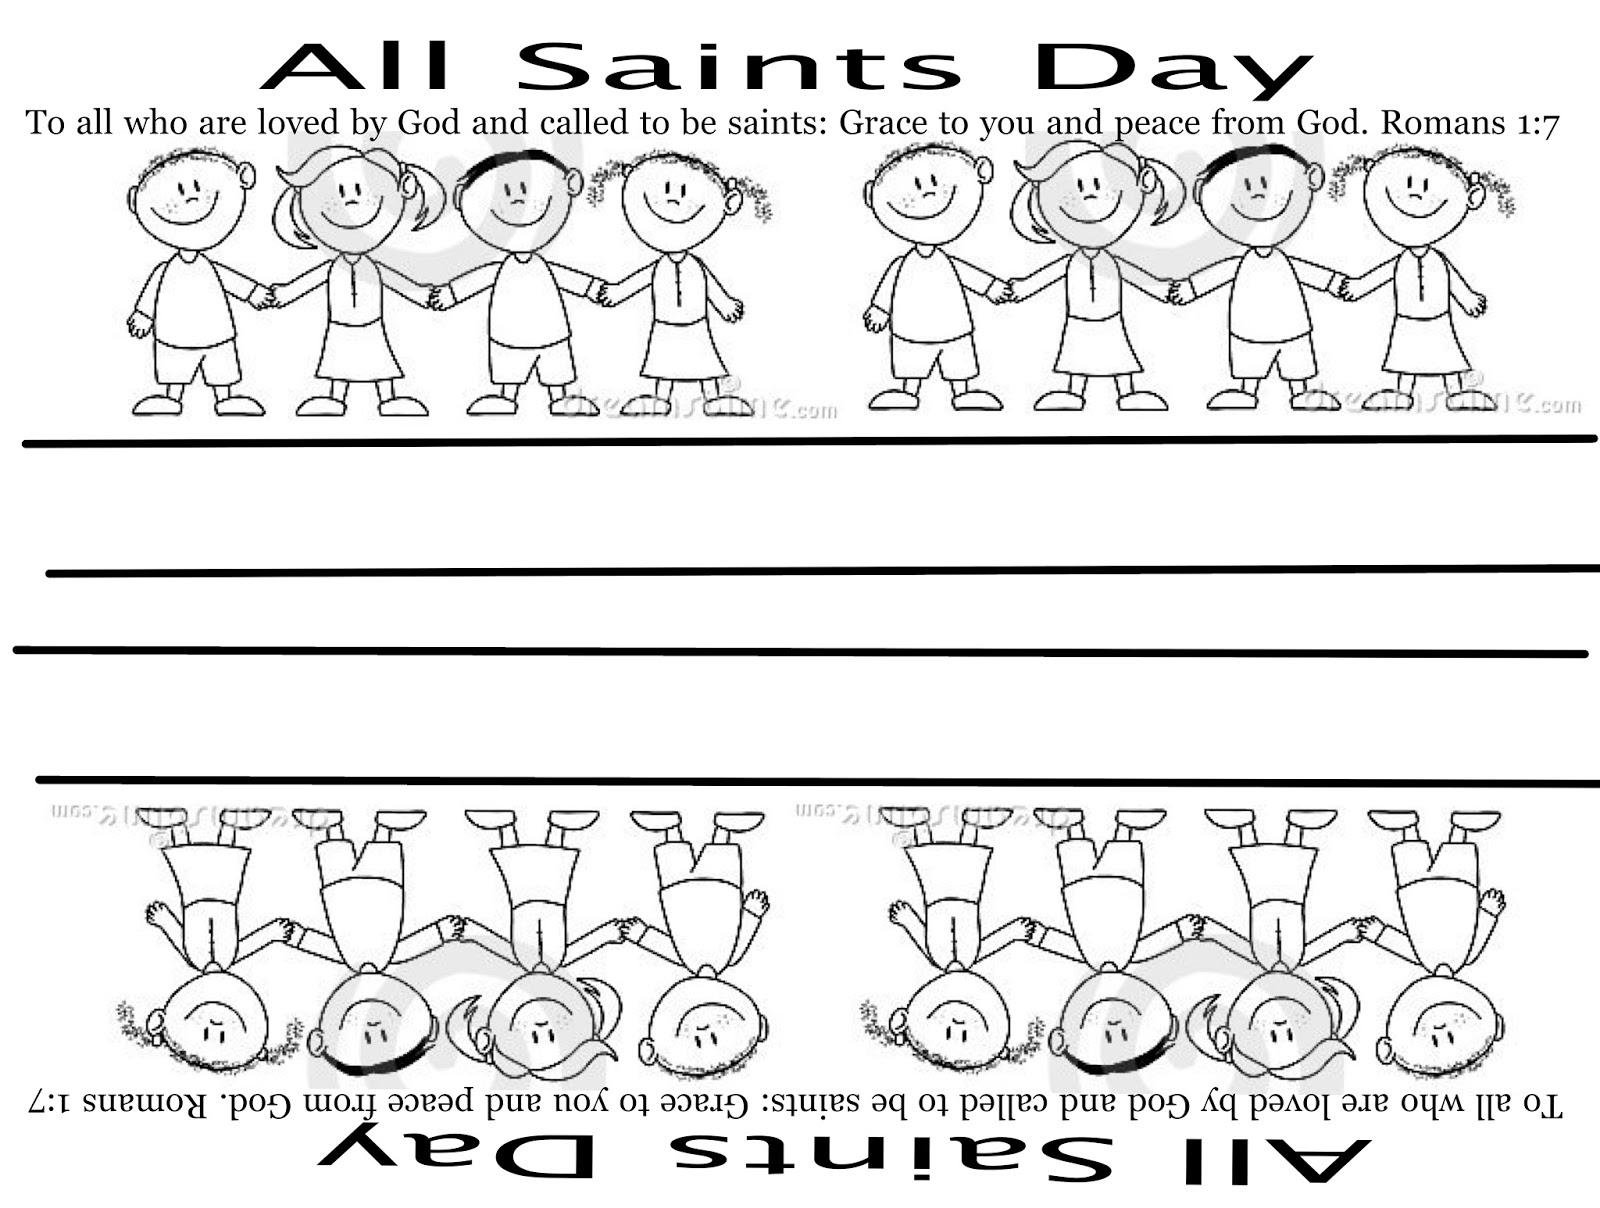 Sunday School Fun All Saints Day